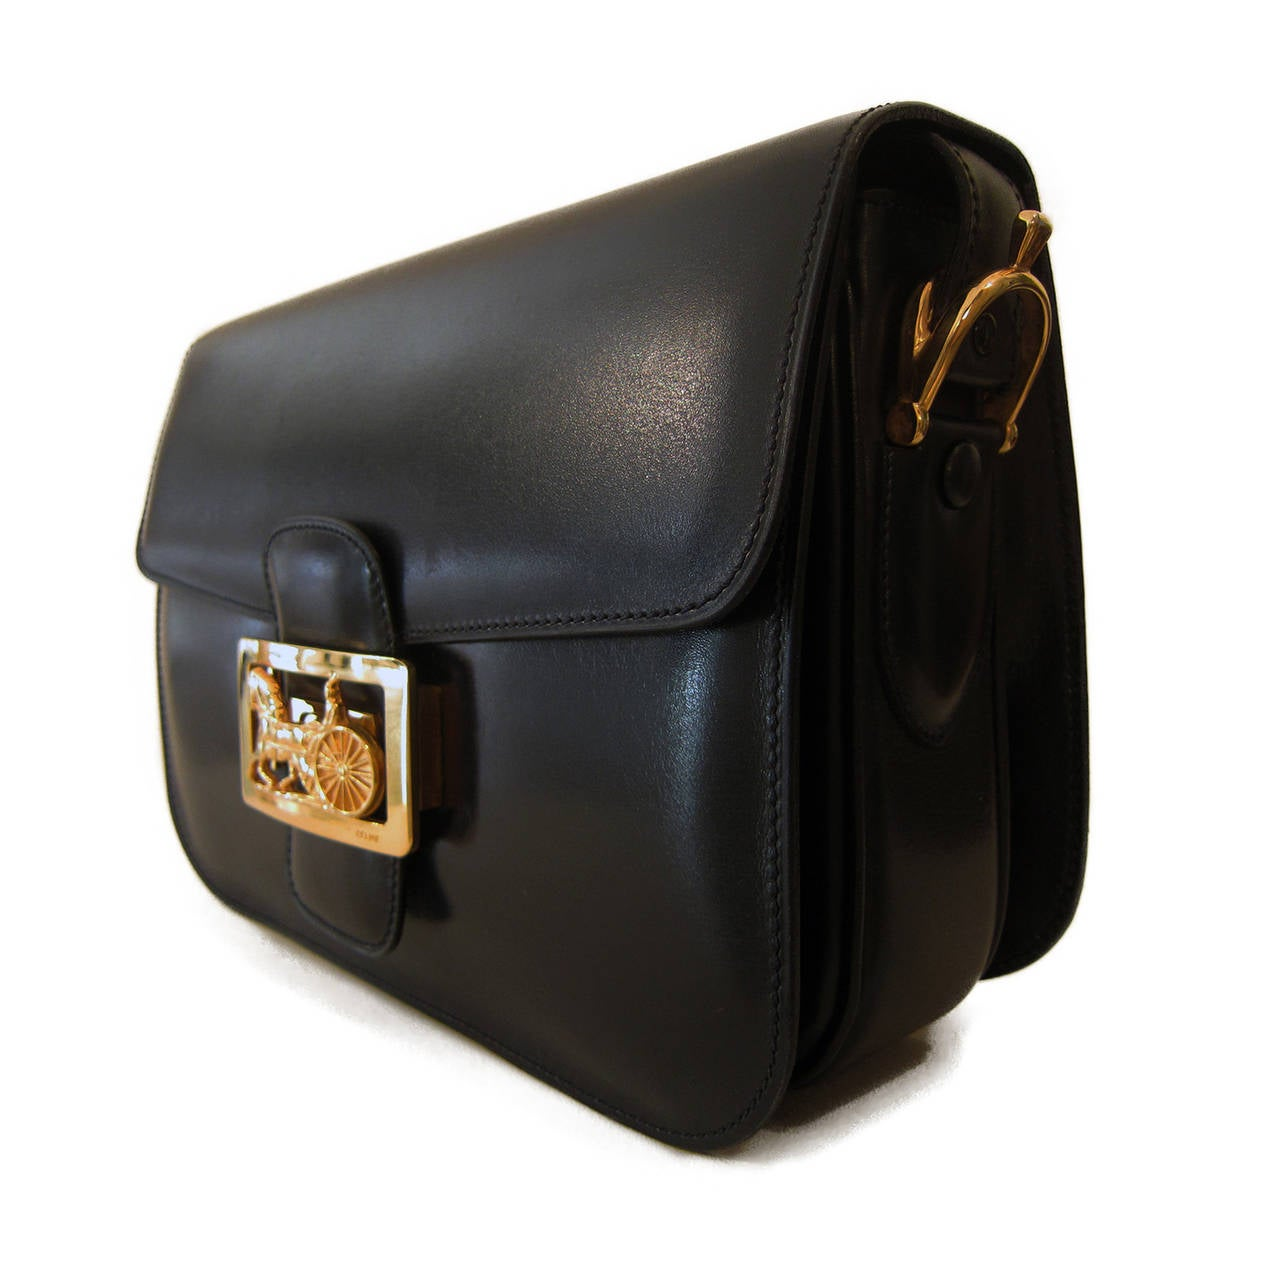 celine trio bag burgundy - celine classic vintage horse and carriage - blue